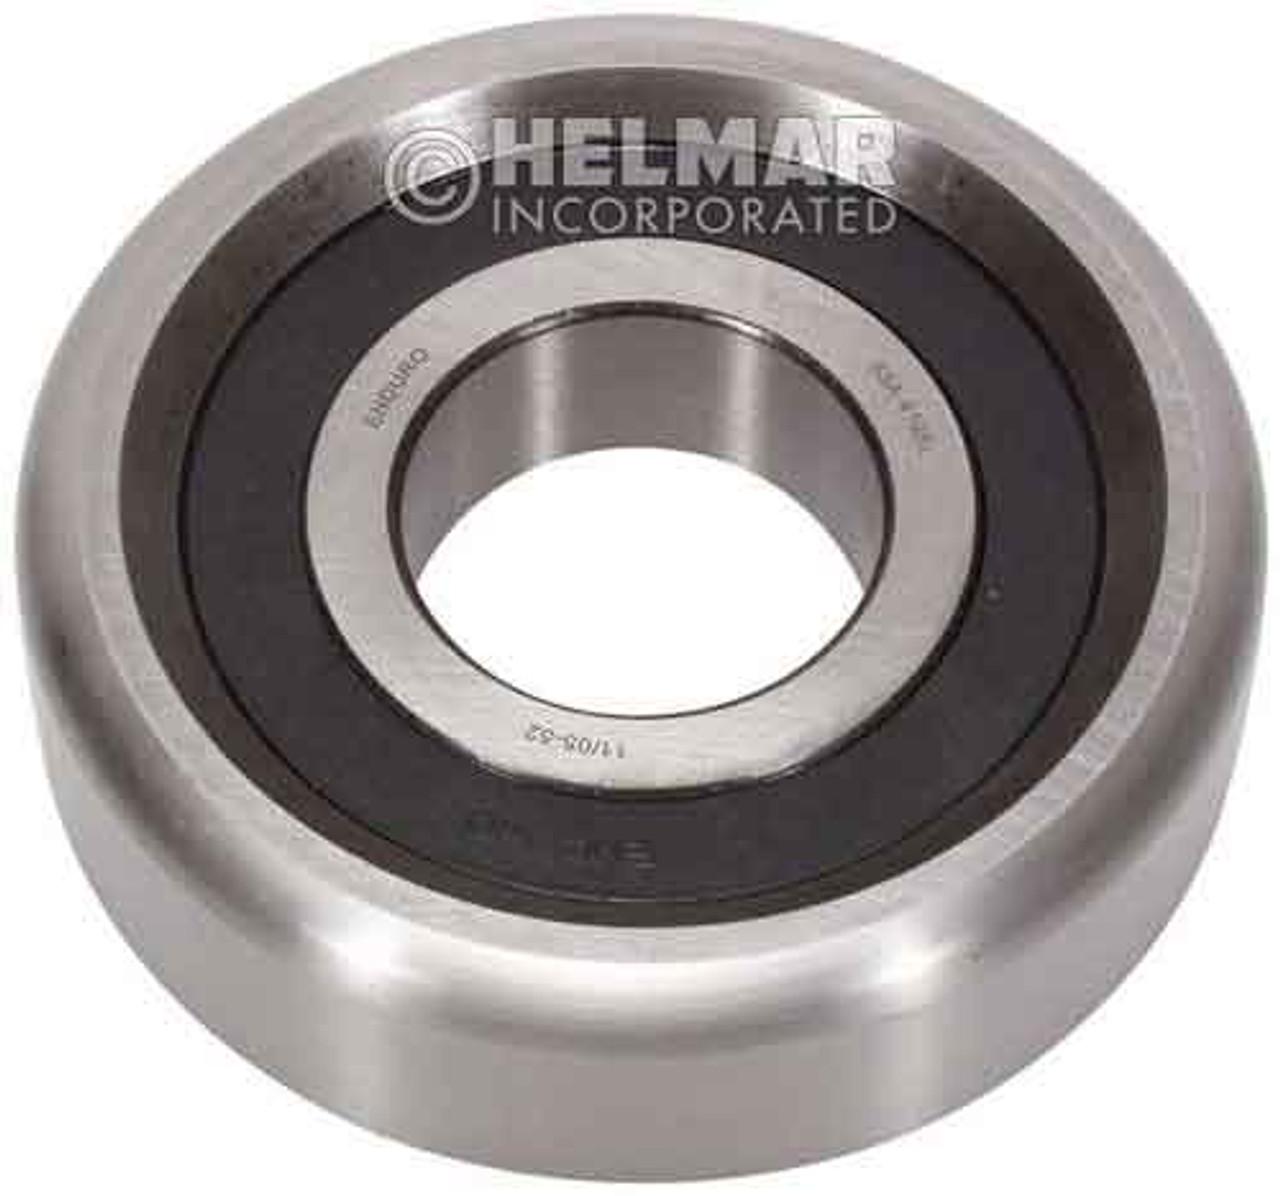 94447-11600 Mitsi/Cat Mast Roller Bearing 35.04mm Wide, 130.00mm Outer Diameter, 49.40mm Inner Diameter